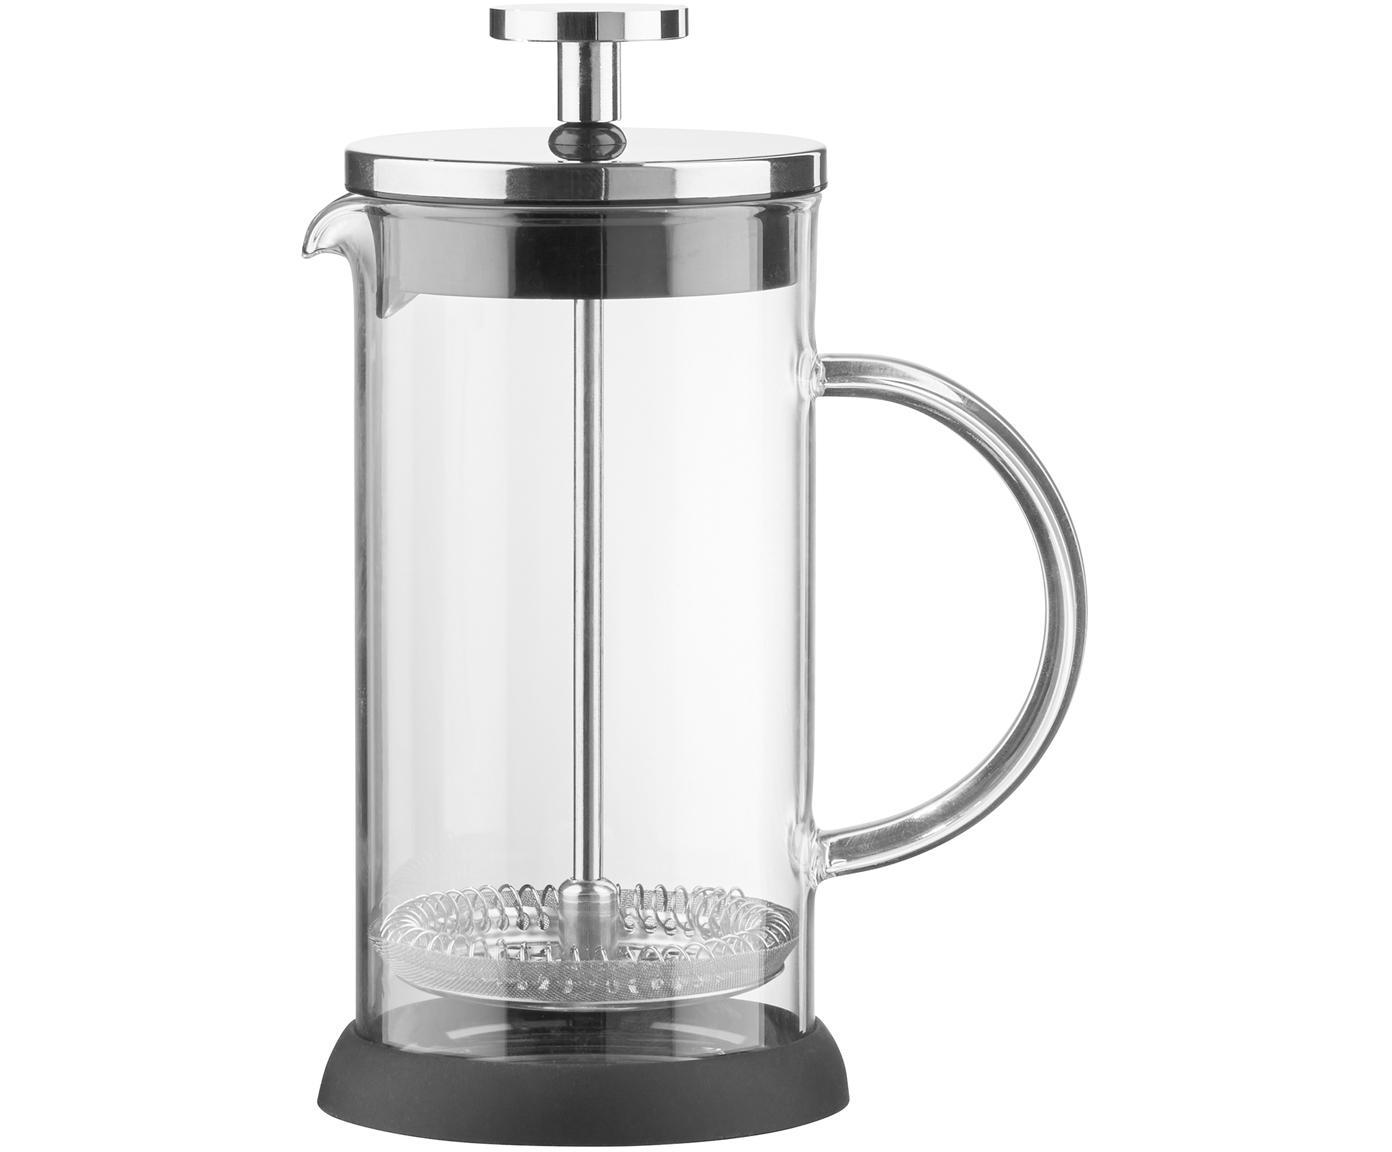 Cafetera Beata, Transparente, acero inoxidable, negro, Ø 14 x Al 22cm